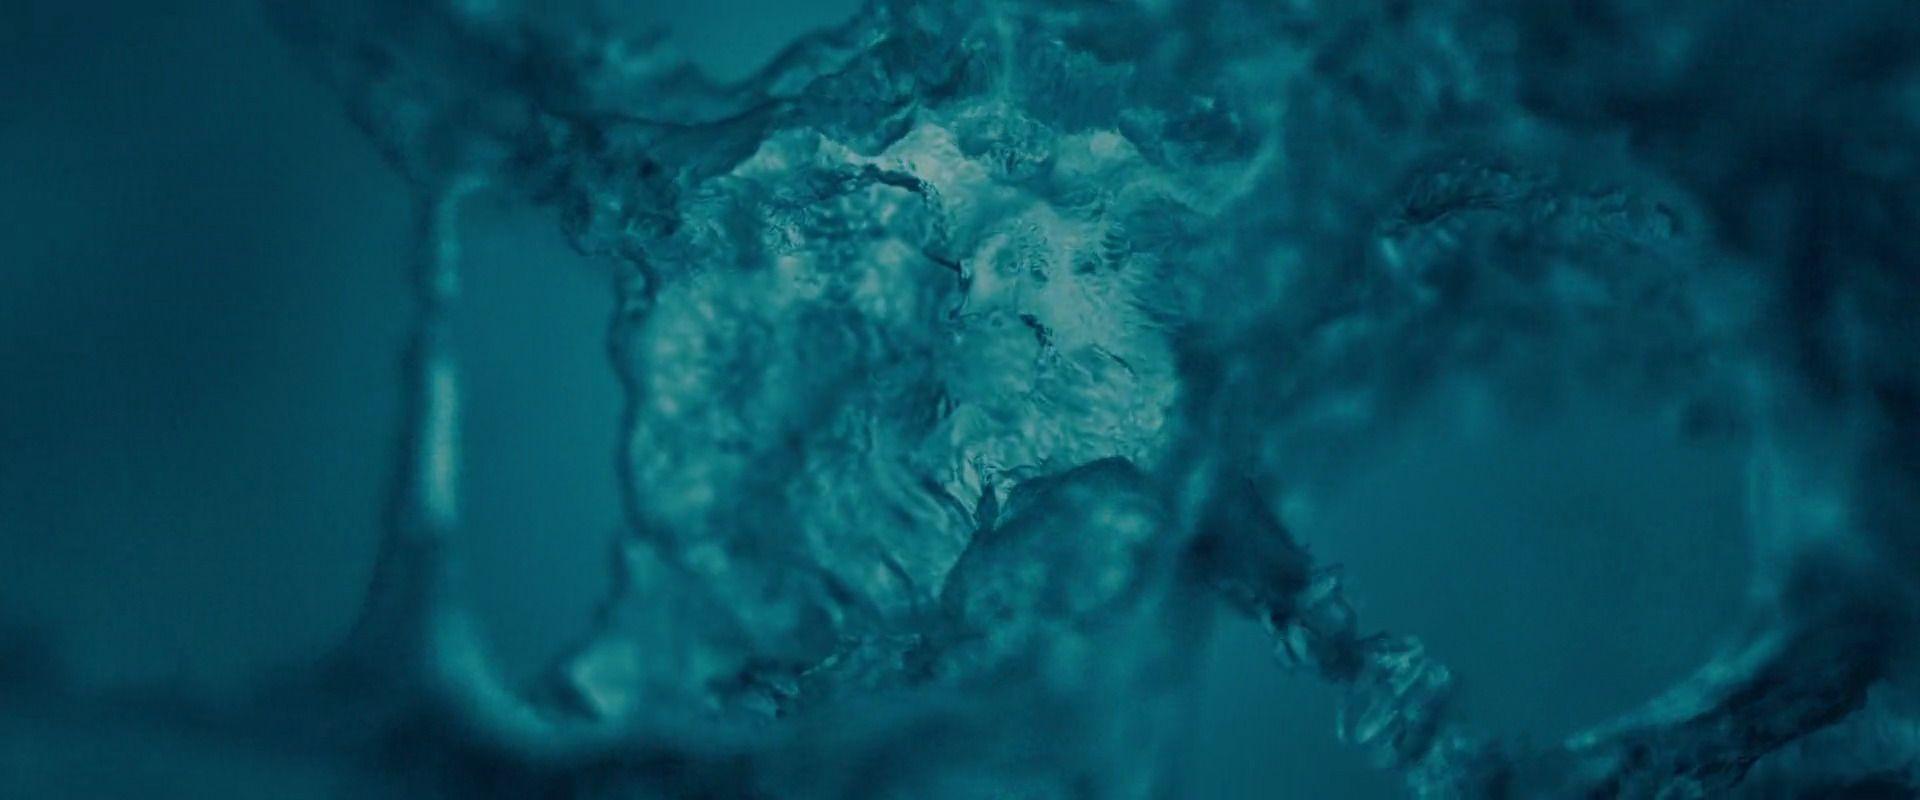 Underworld: Awakening (2012) - Movie Screencaps.com